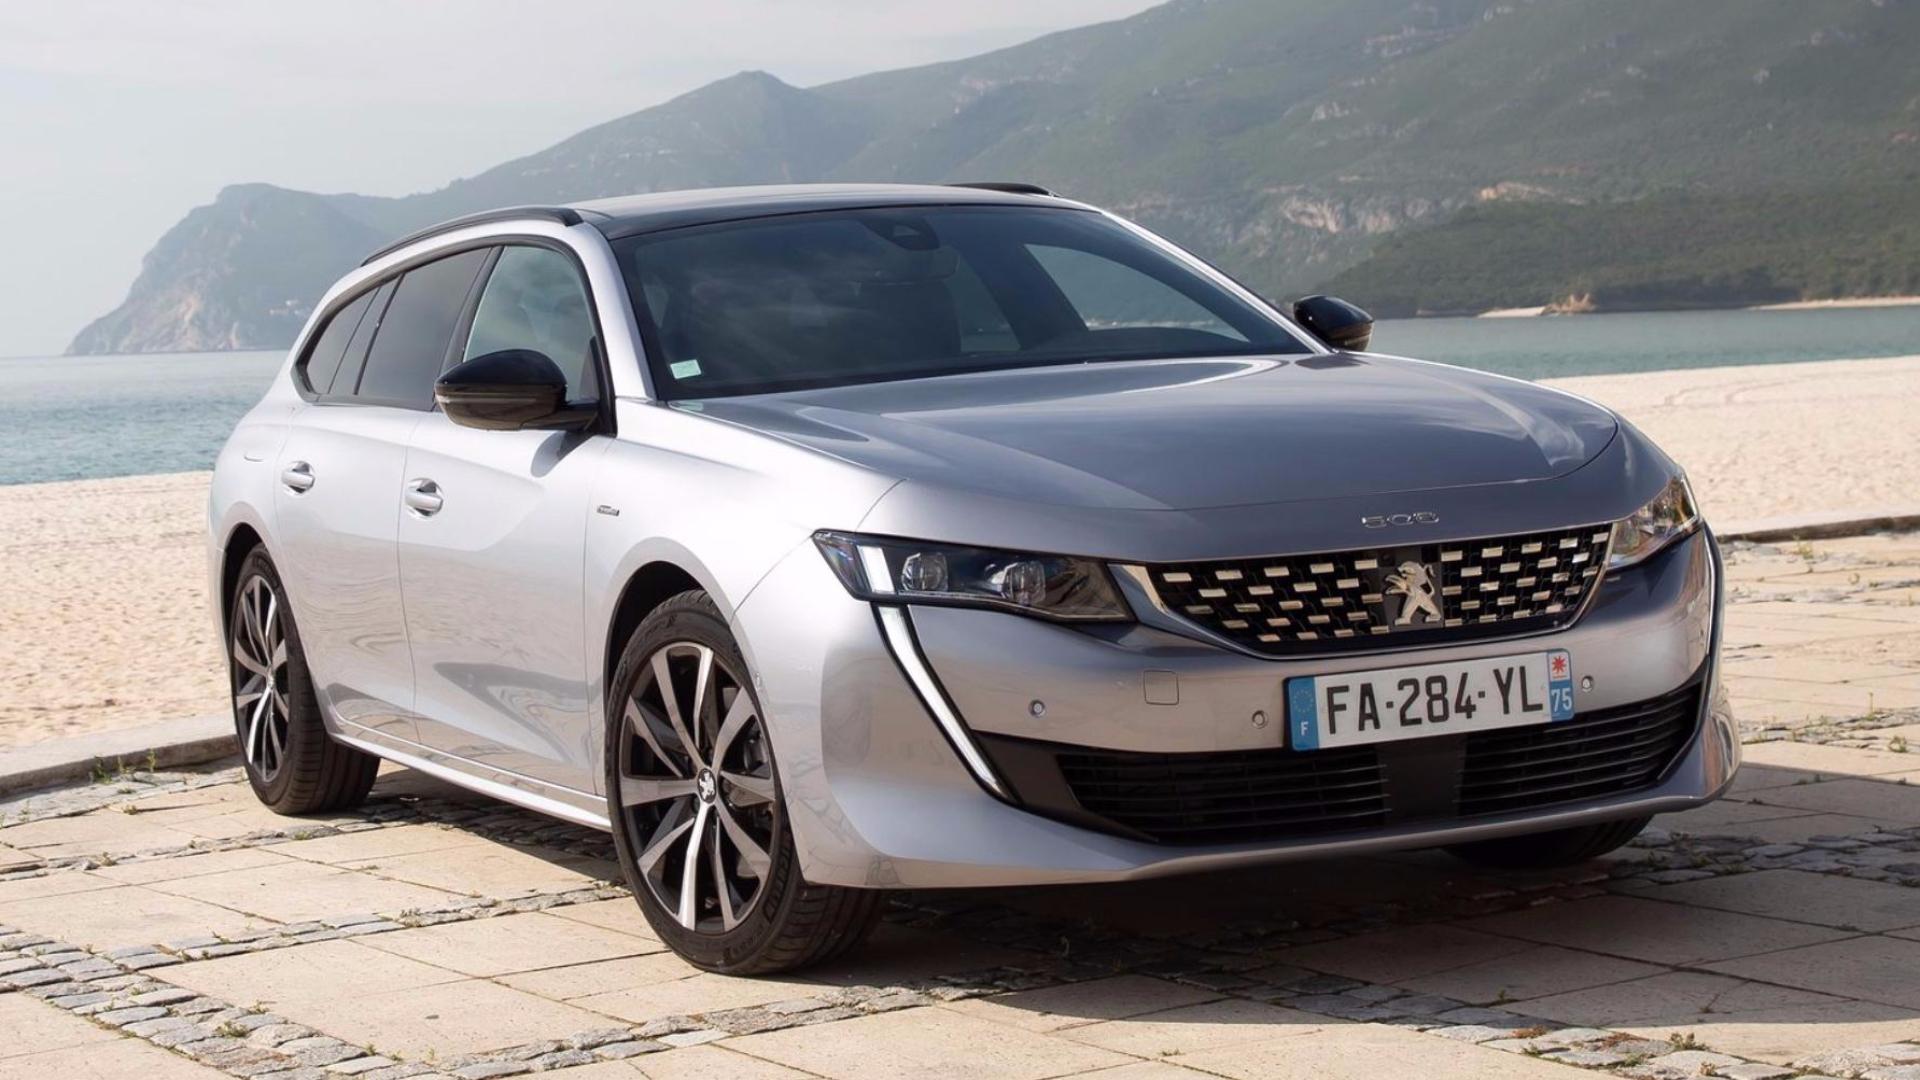 Peugeot akce - sleva až 21%